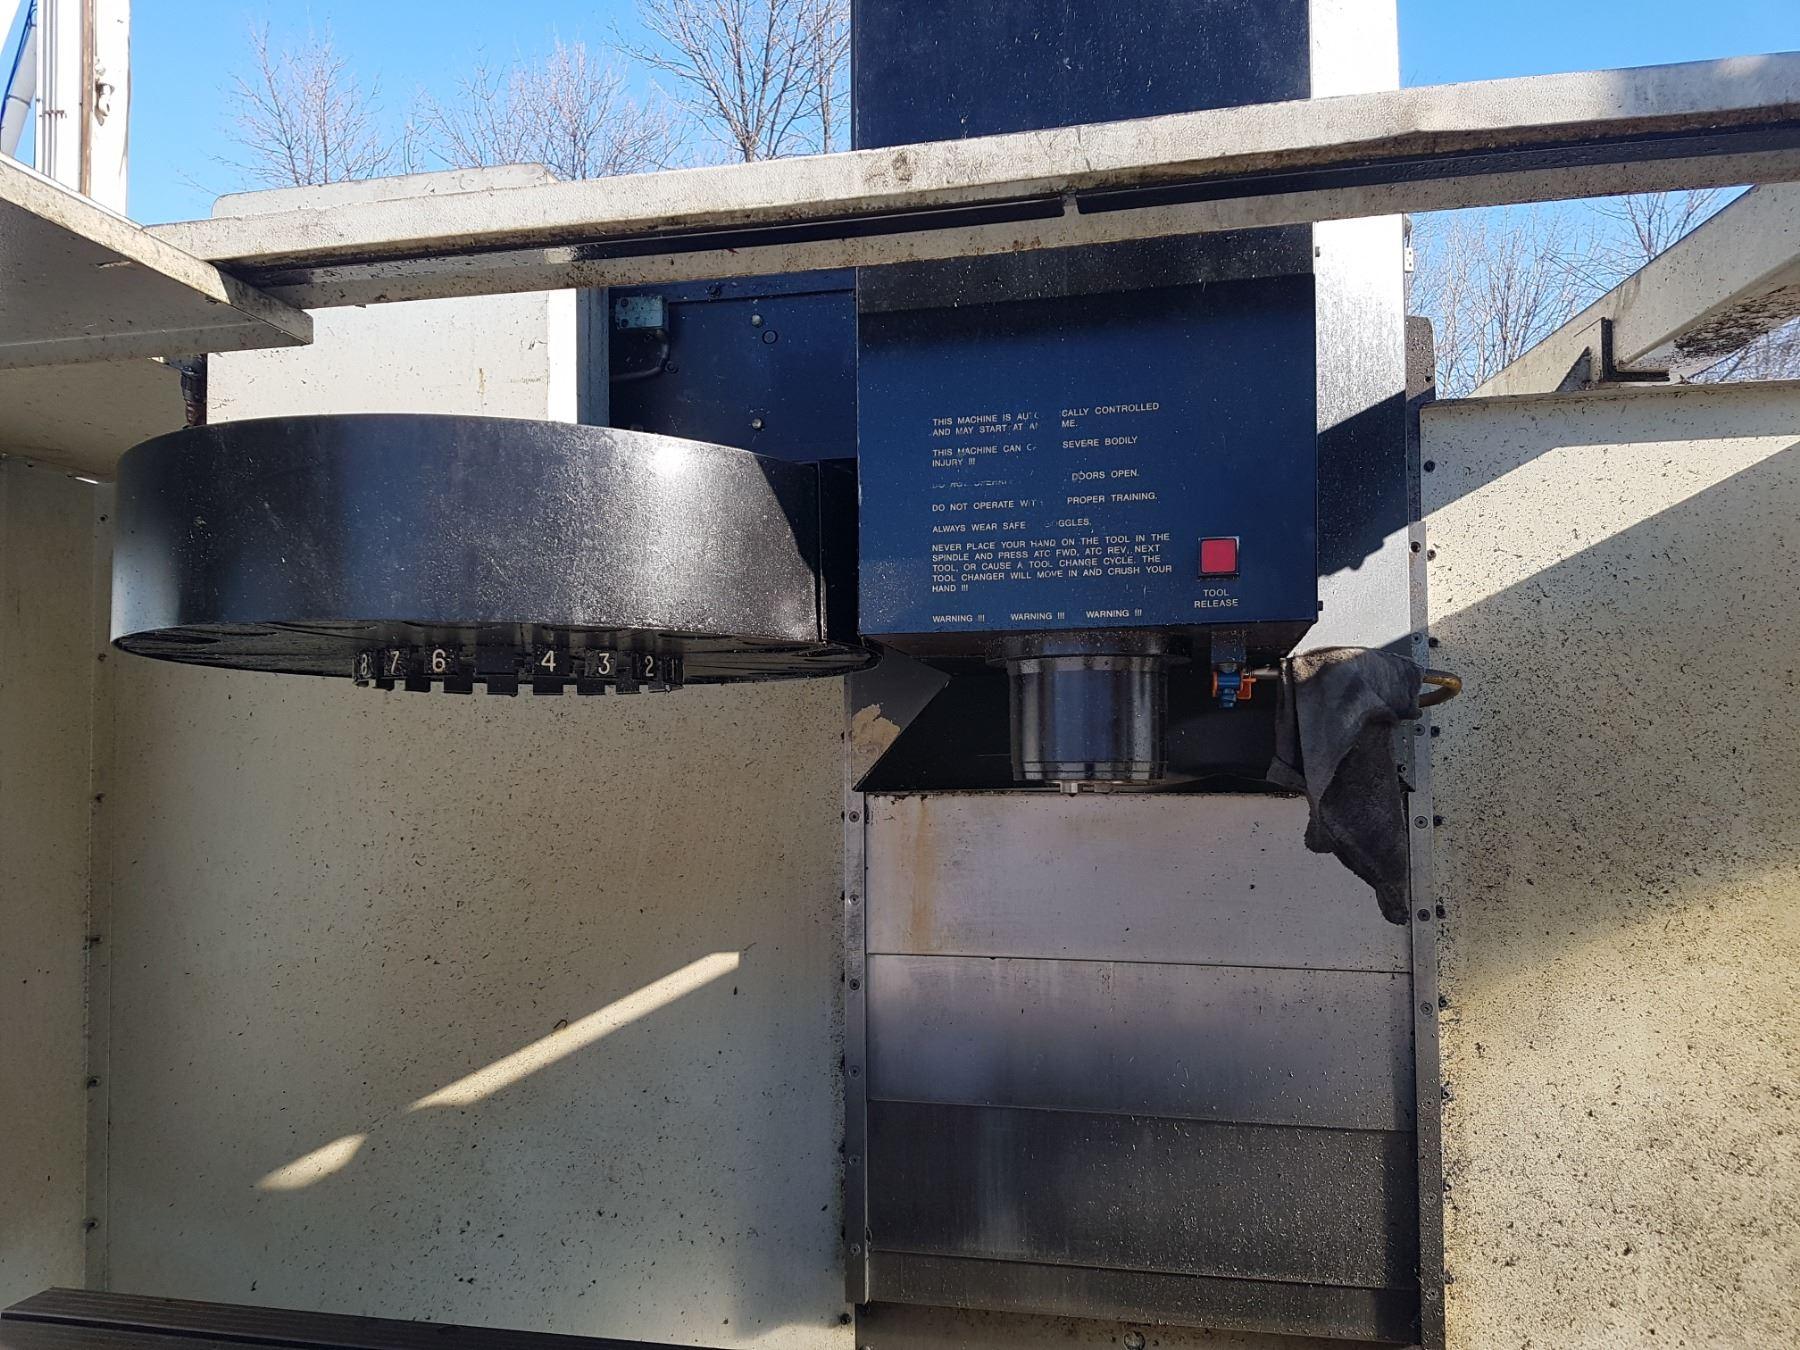 HAAS CNC Milling machine Model: VF-4 (Broken board system)